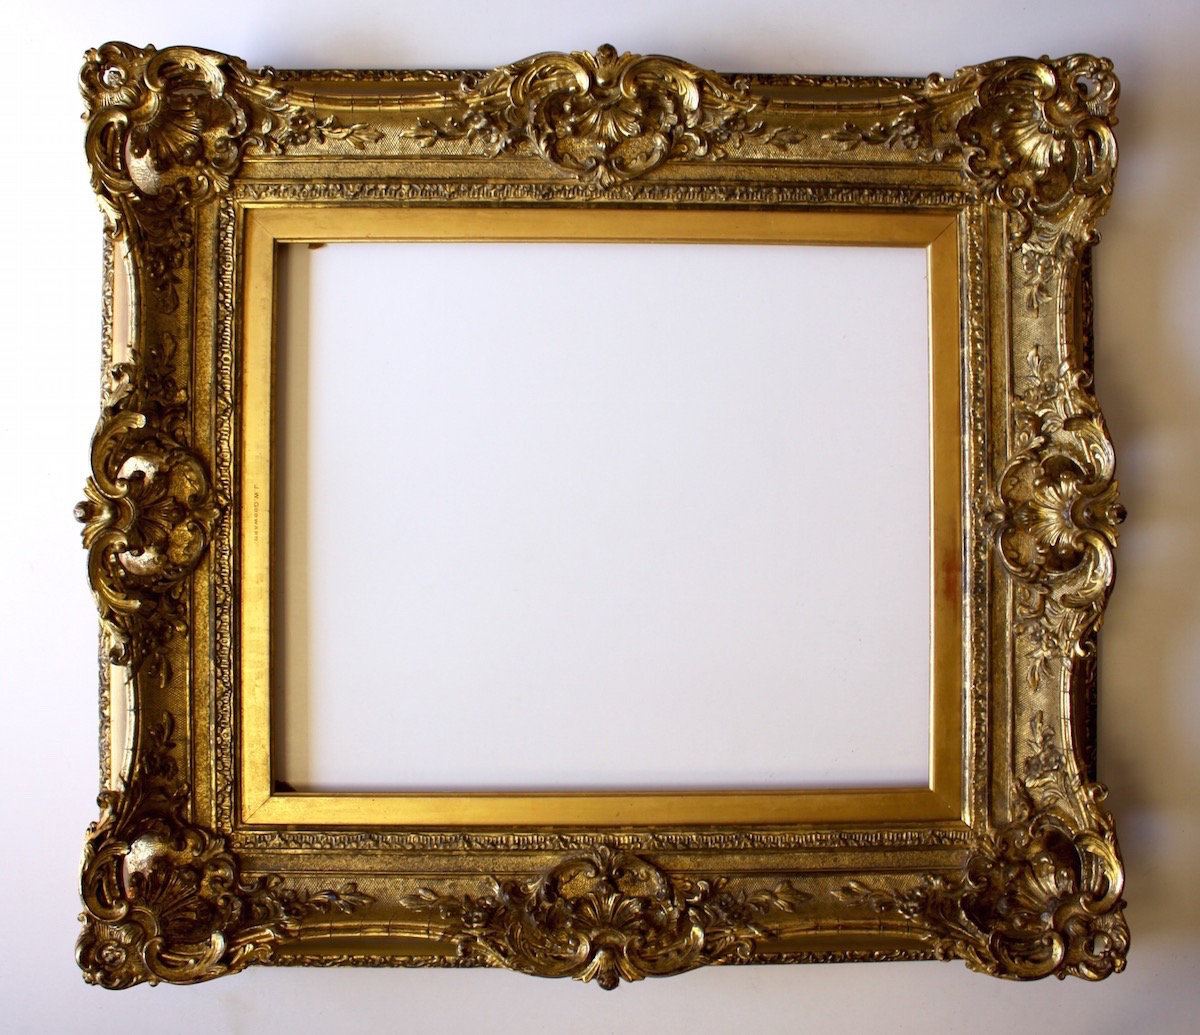 Restoration - Rich and Davis Artisan Frame Makers